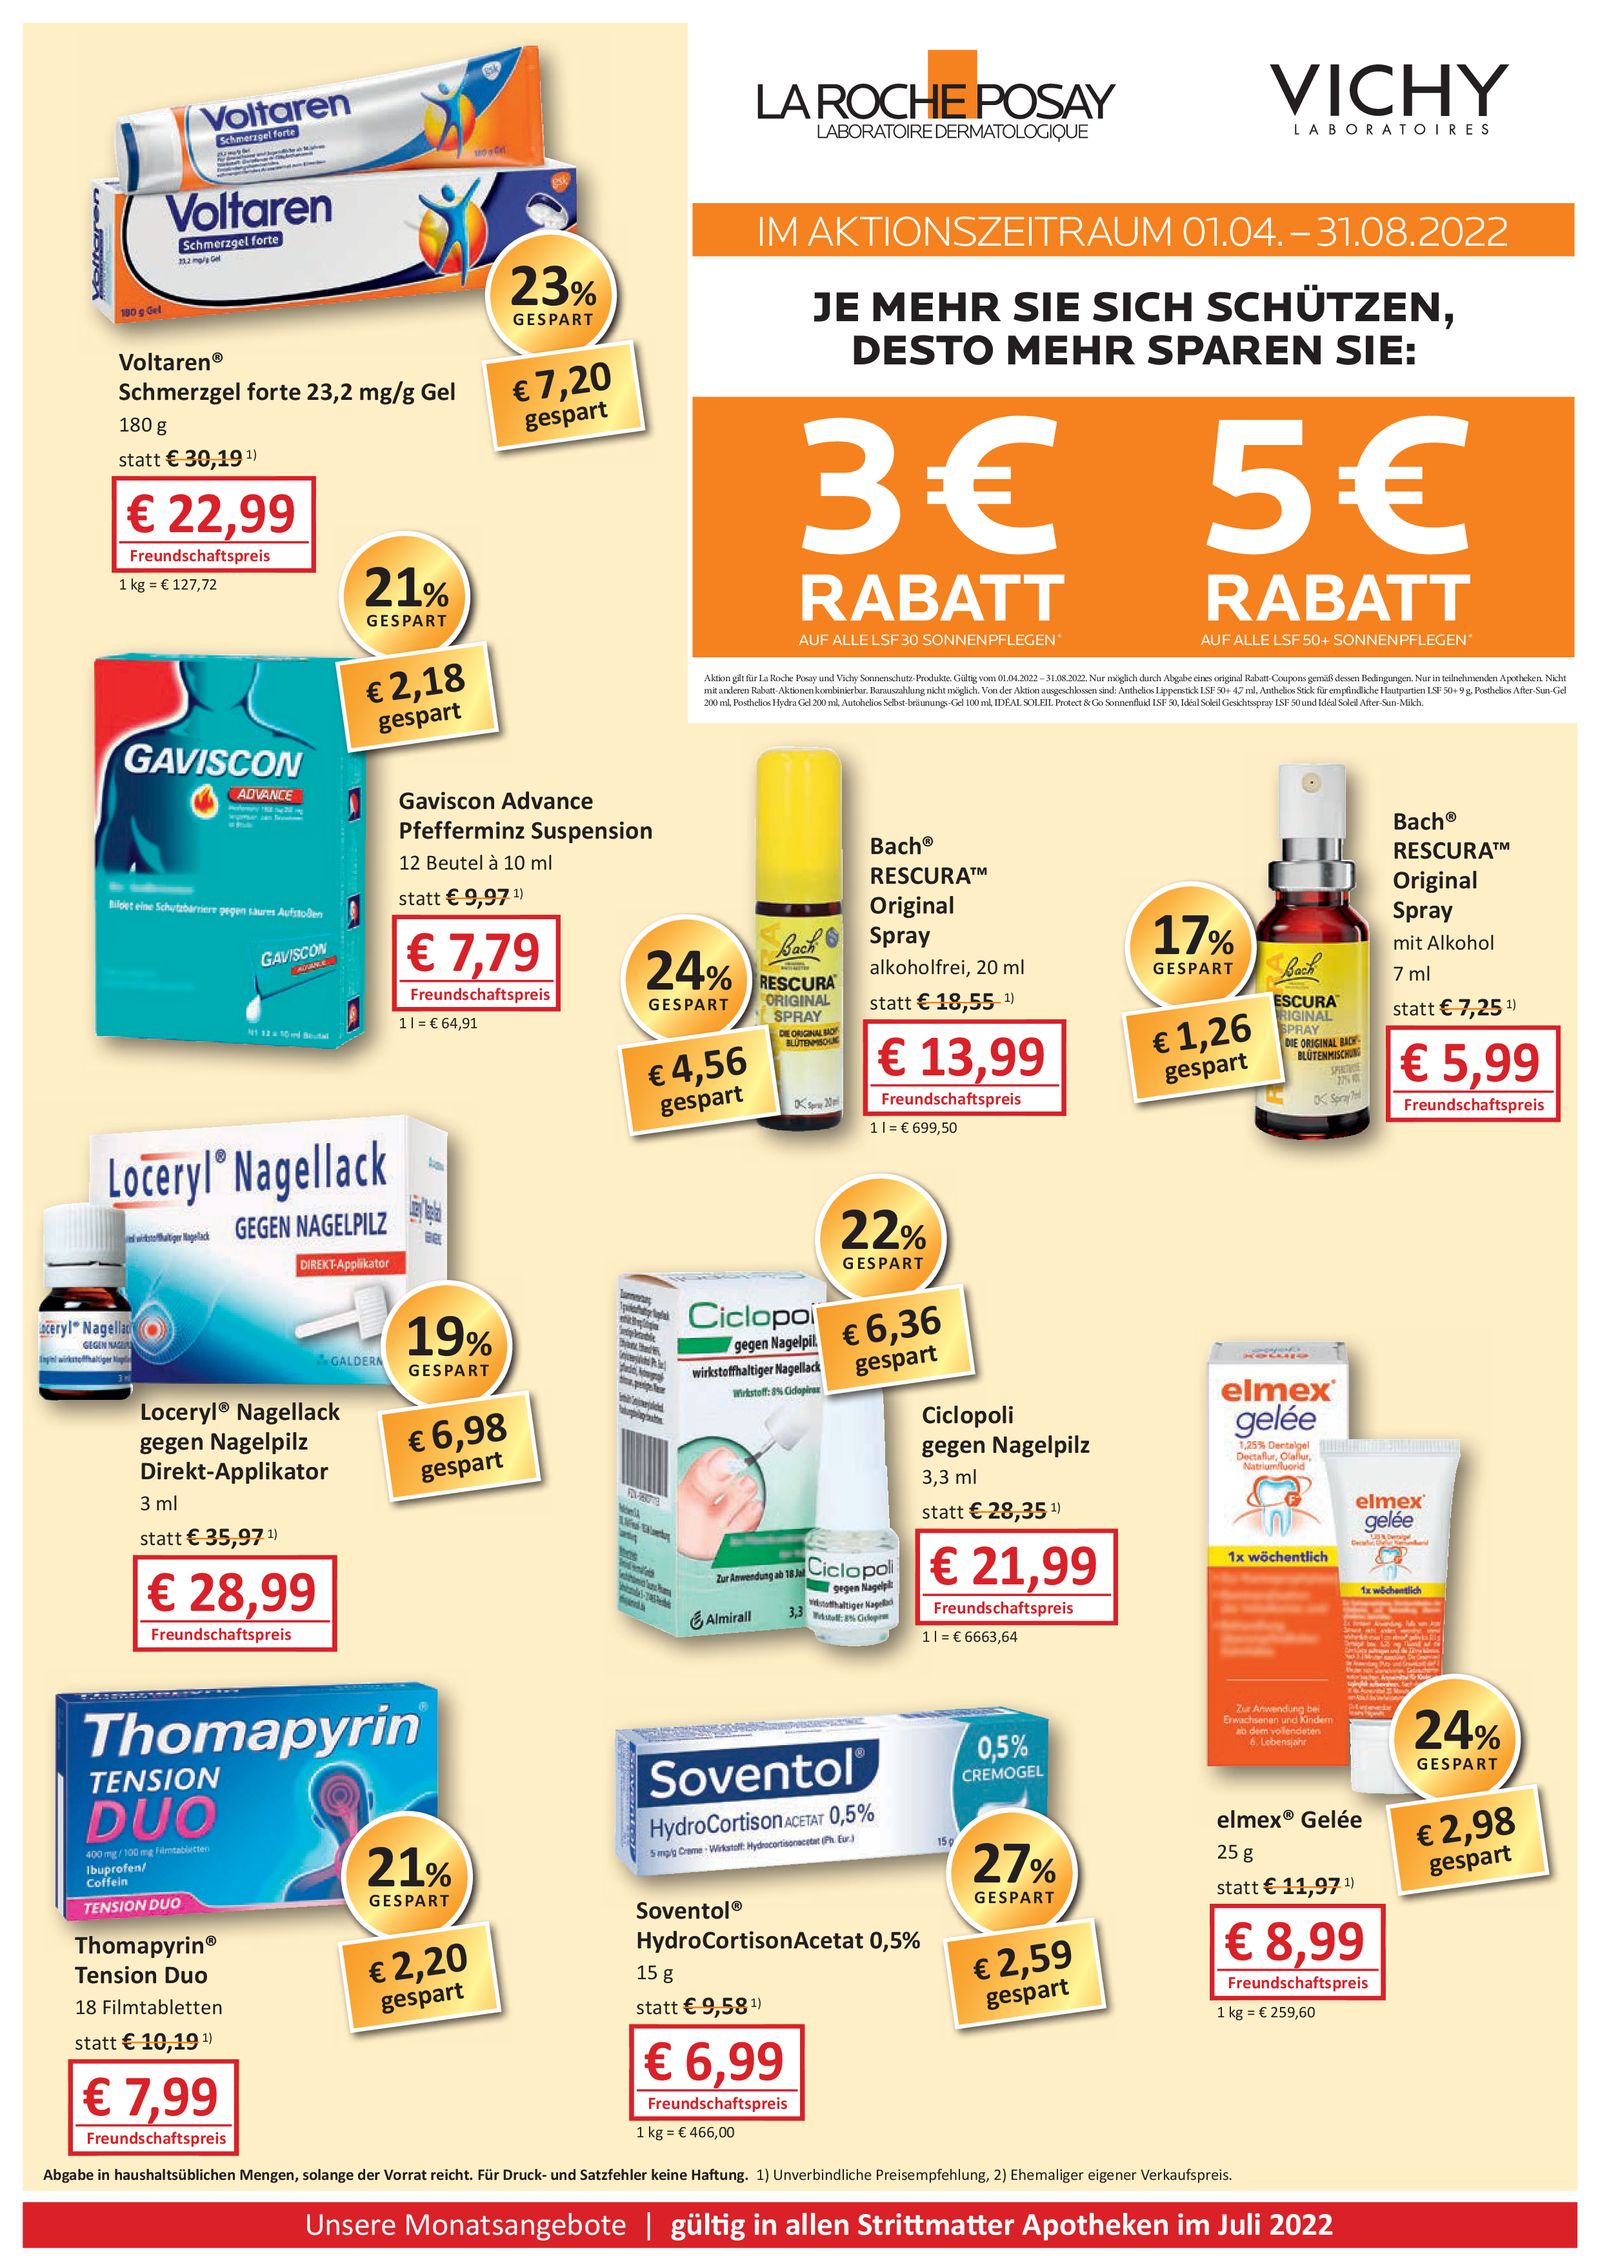 https://mein-uploads.apocdn.net/9824/leaflets/9824_flyer-Seite3.png